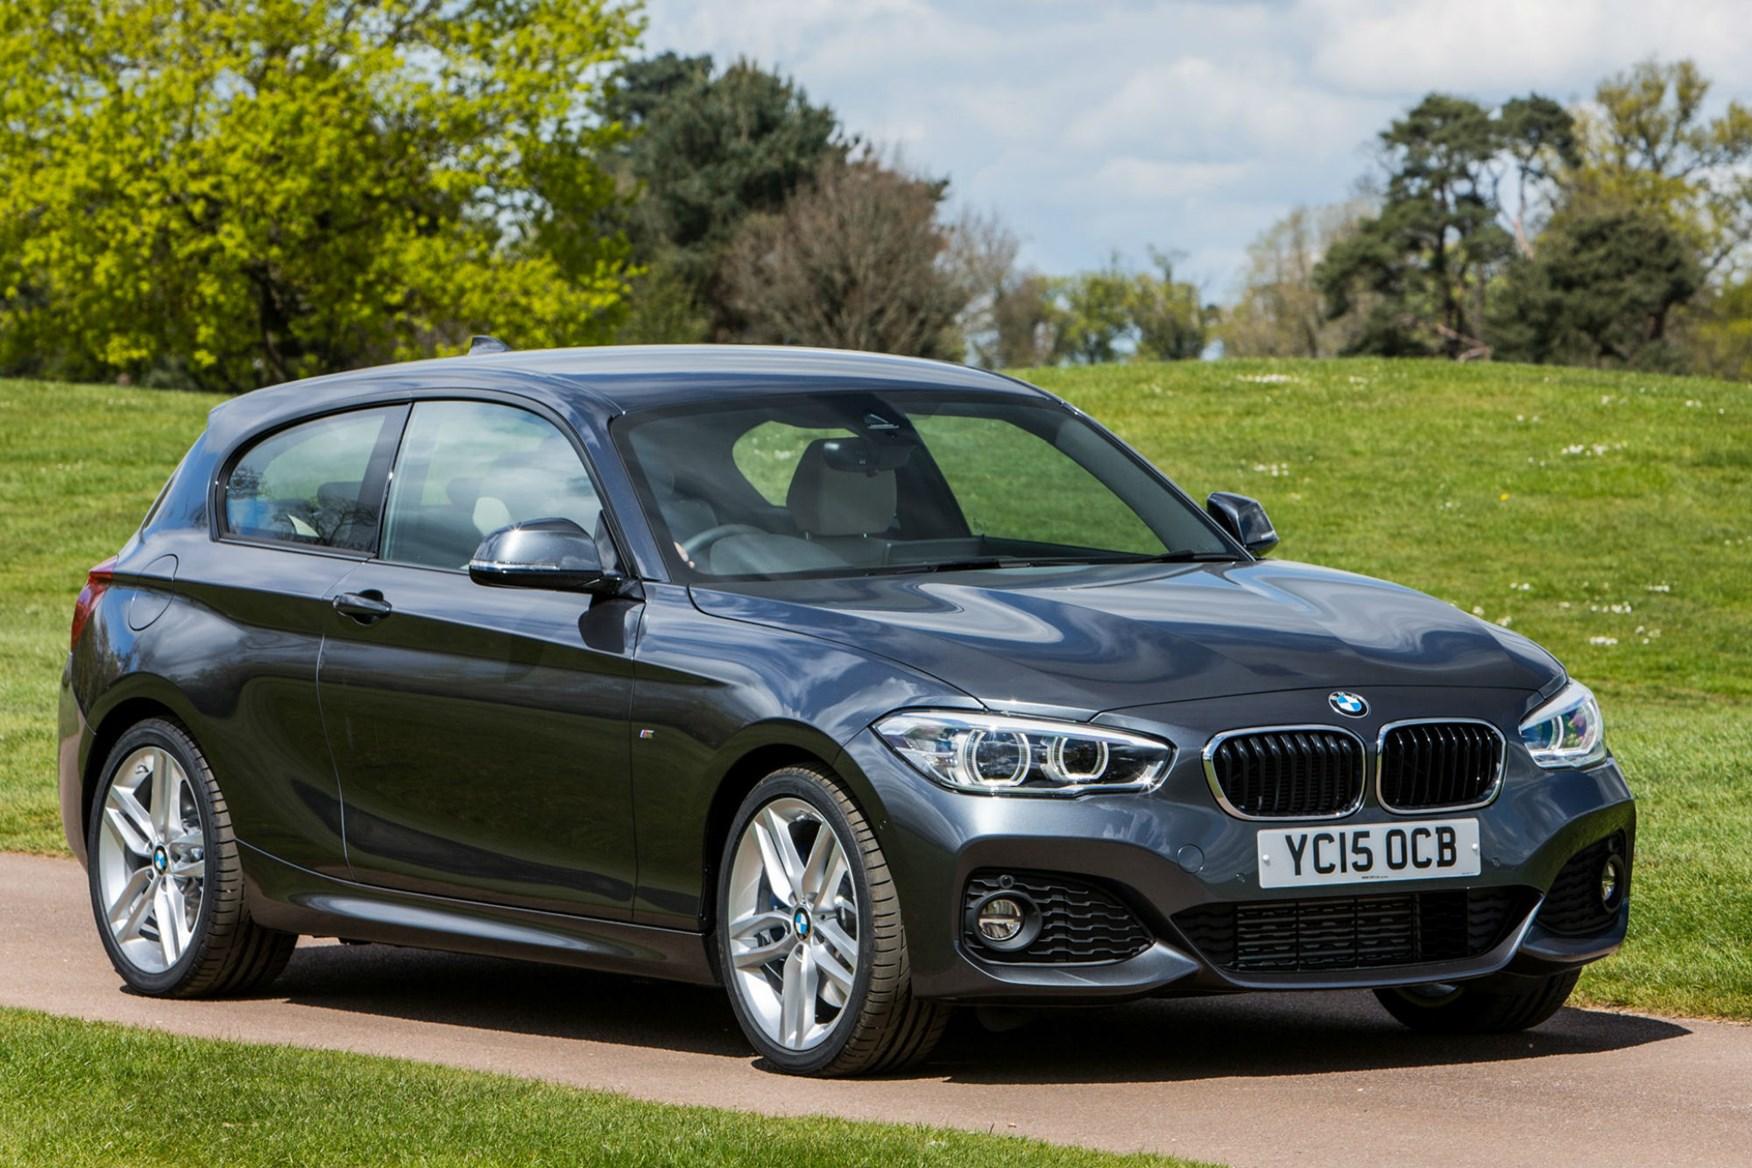 BMW 1 Series PCP finance